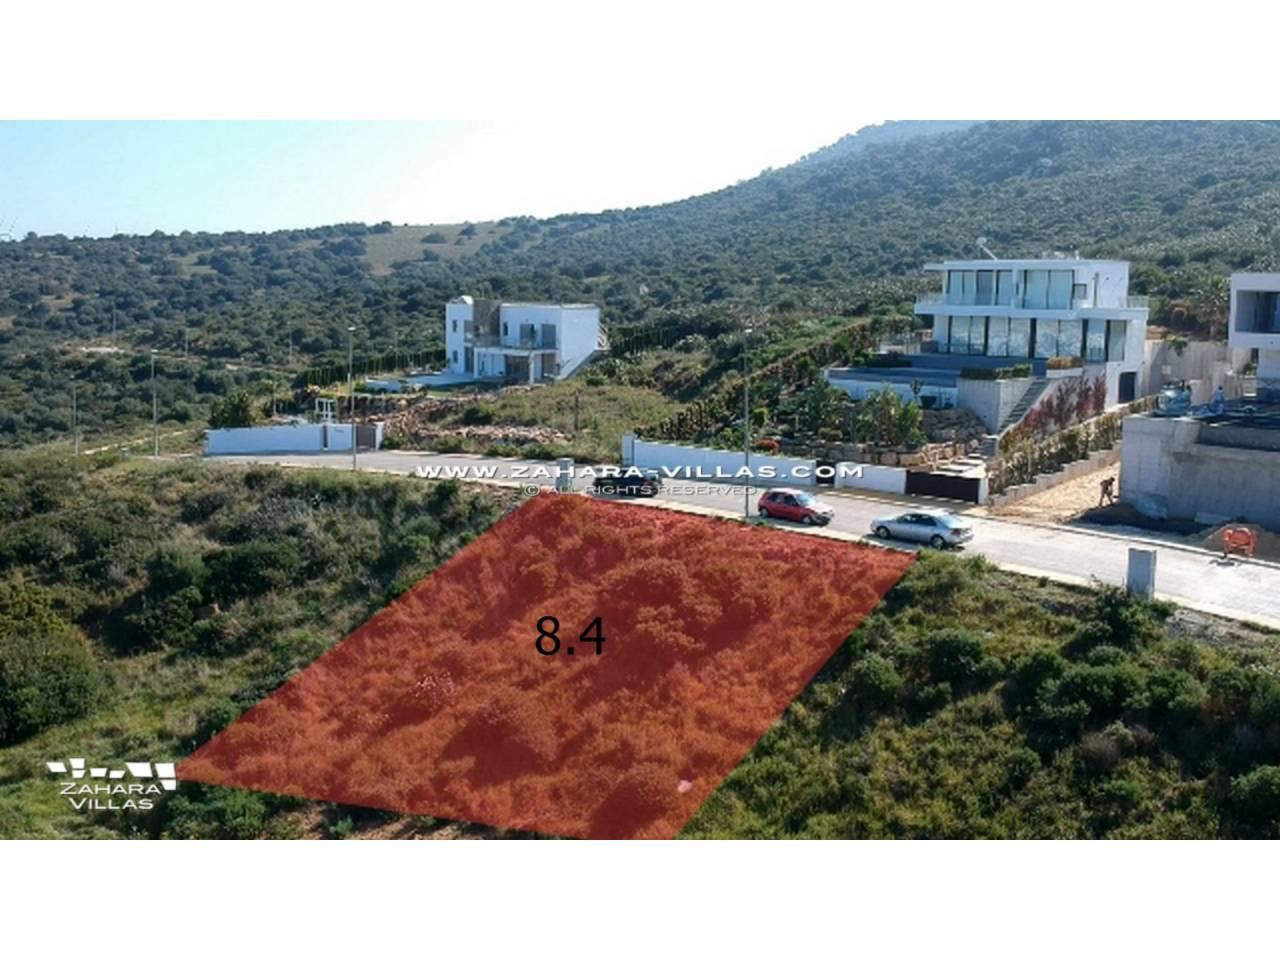 Imagen 1 de Baugrundstück für Einfamilienhäuser mit Meerblick